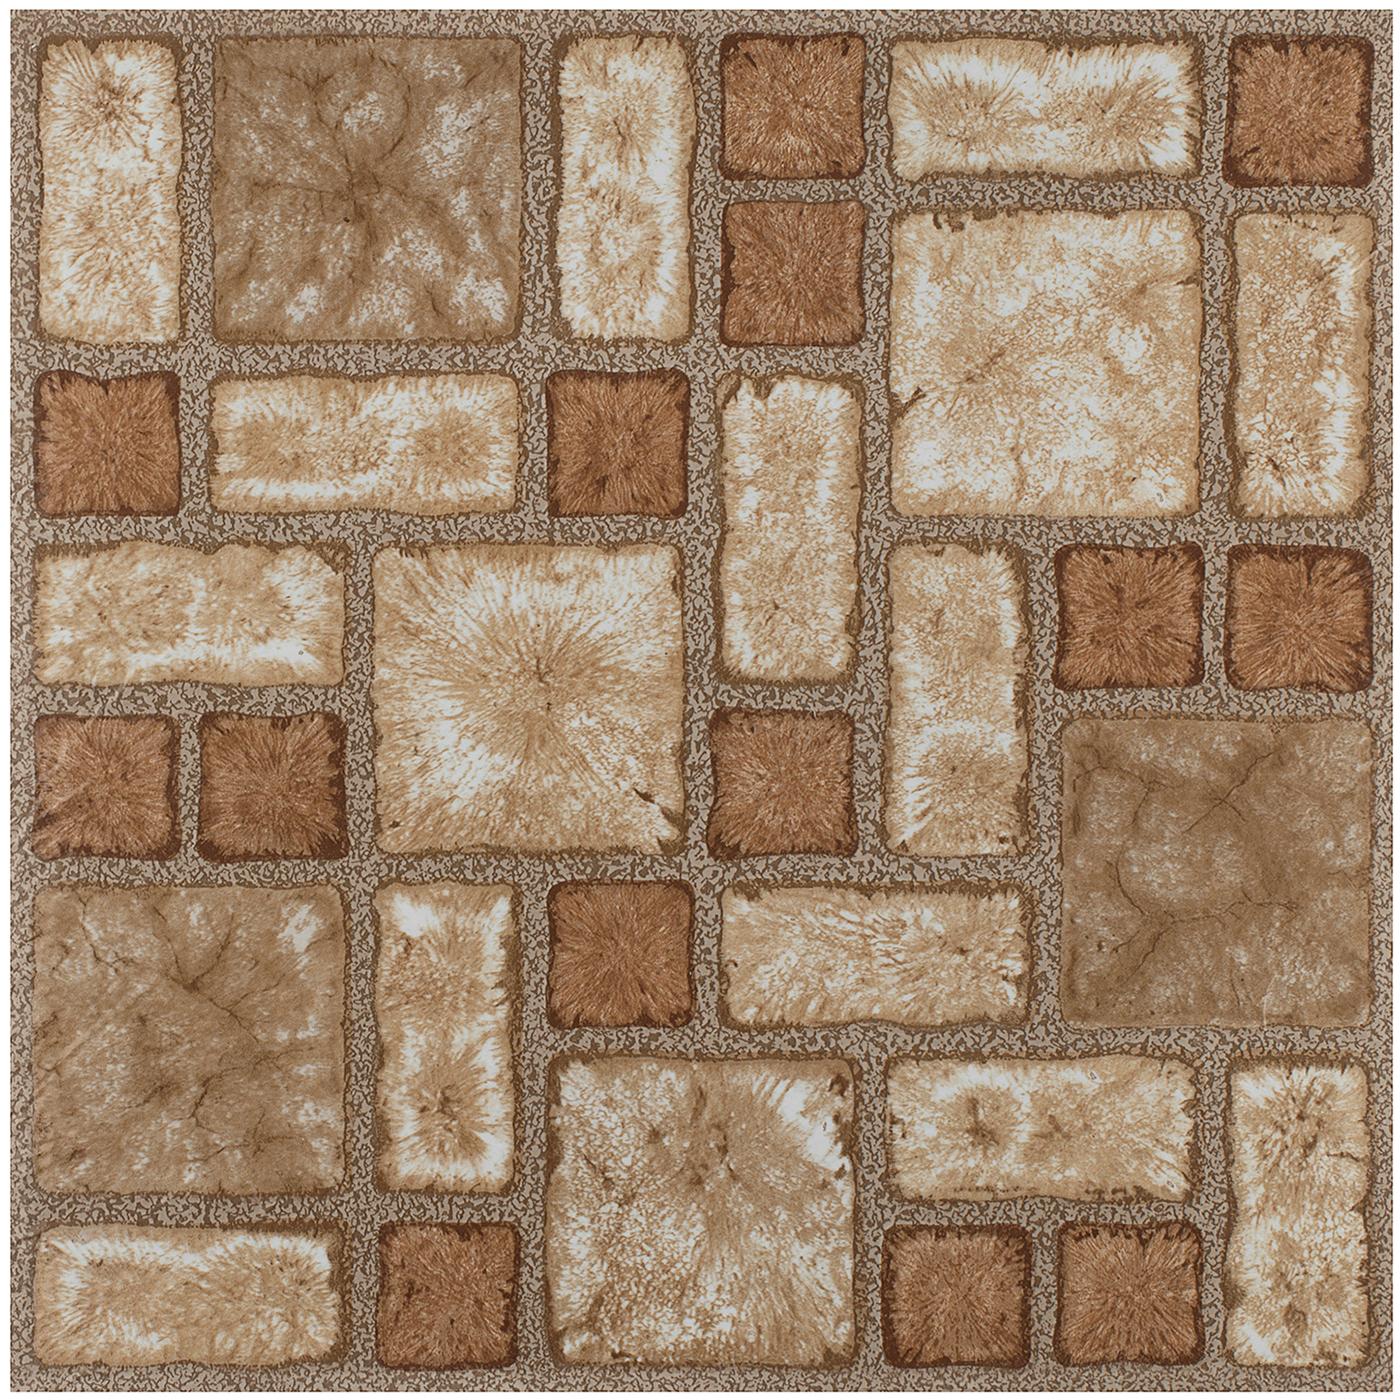 Sticky Floor: Vinyl Floor Tiles Wood & Marble Look 2mm Thick Highly